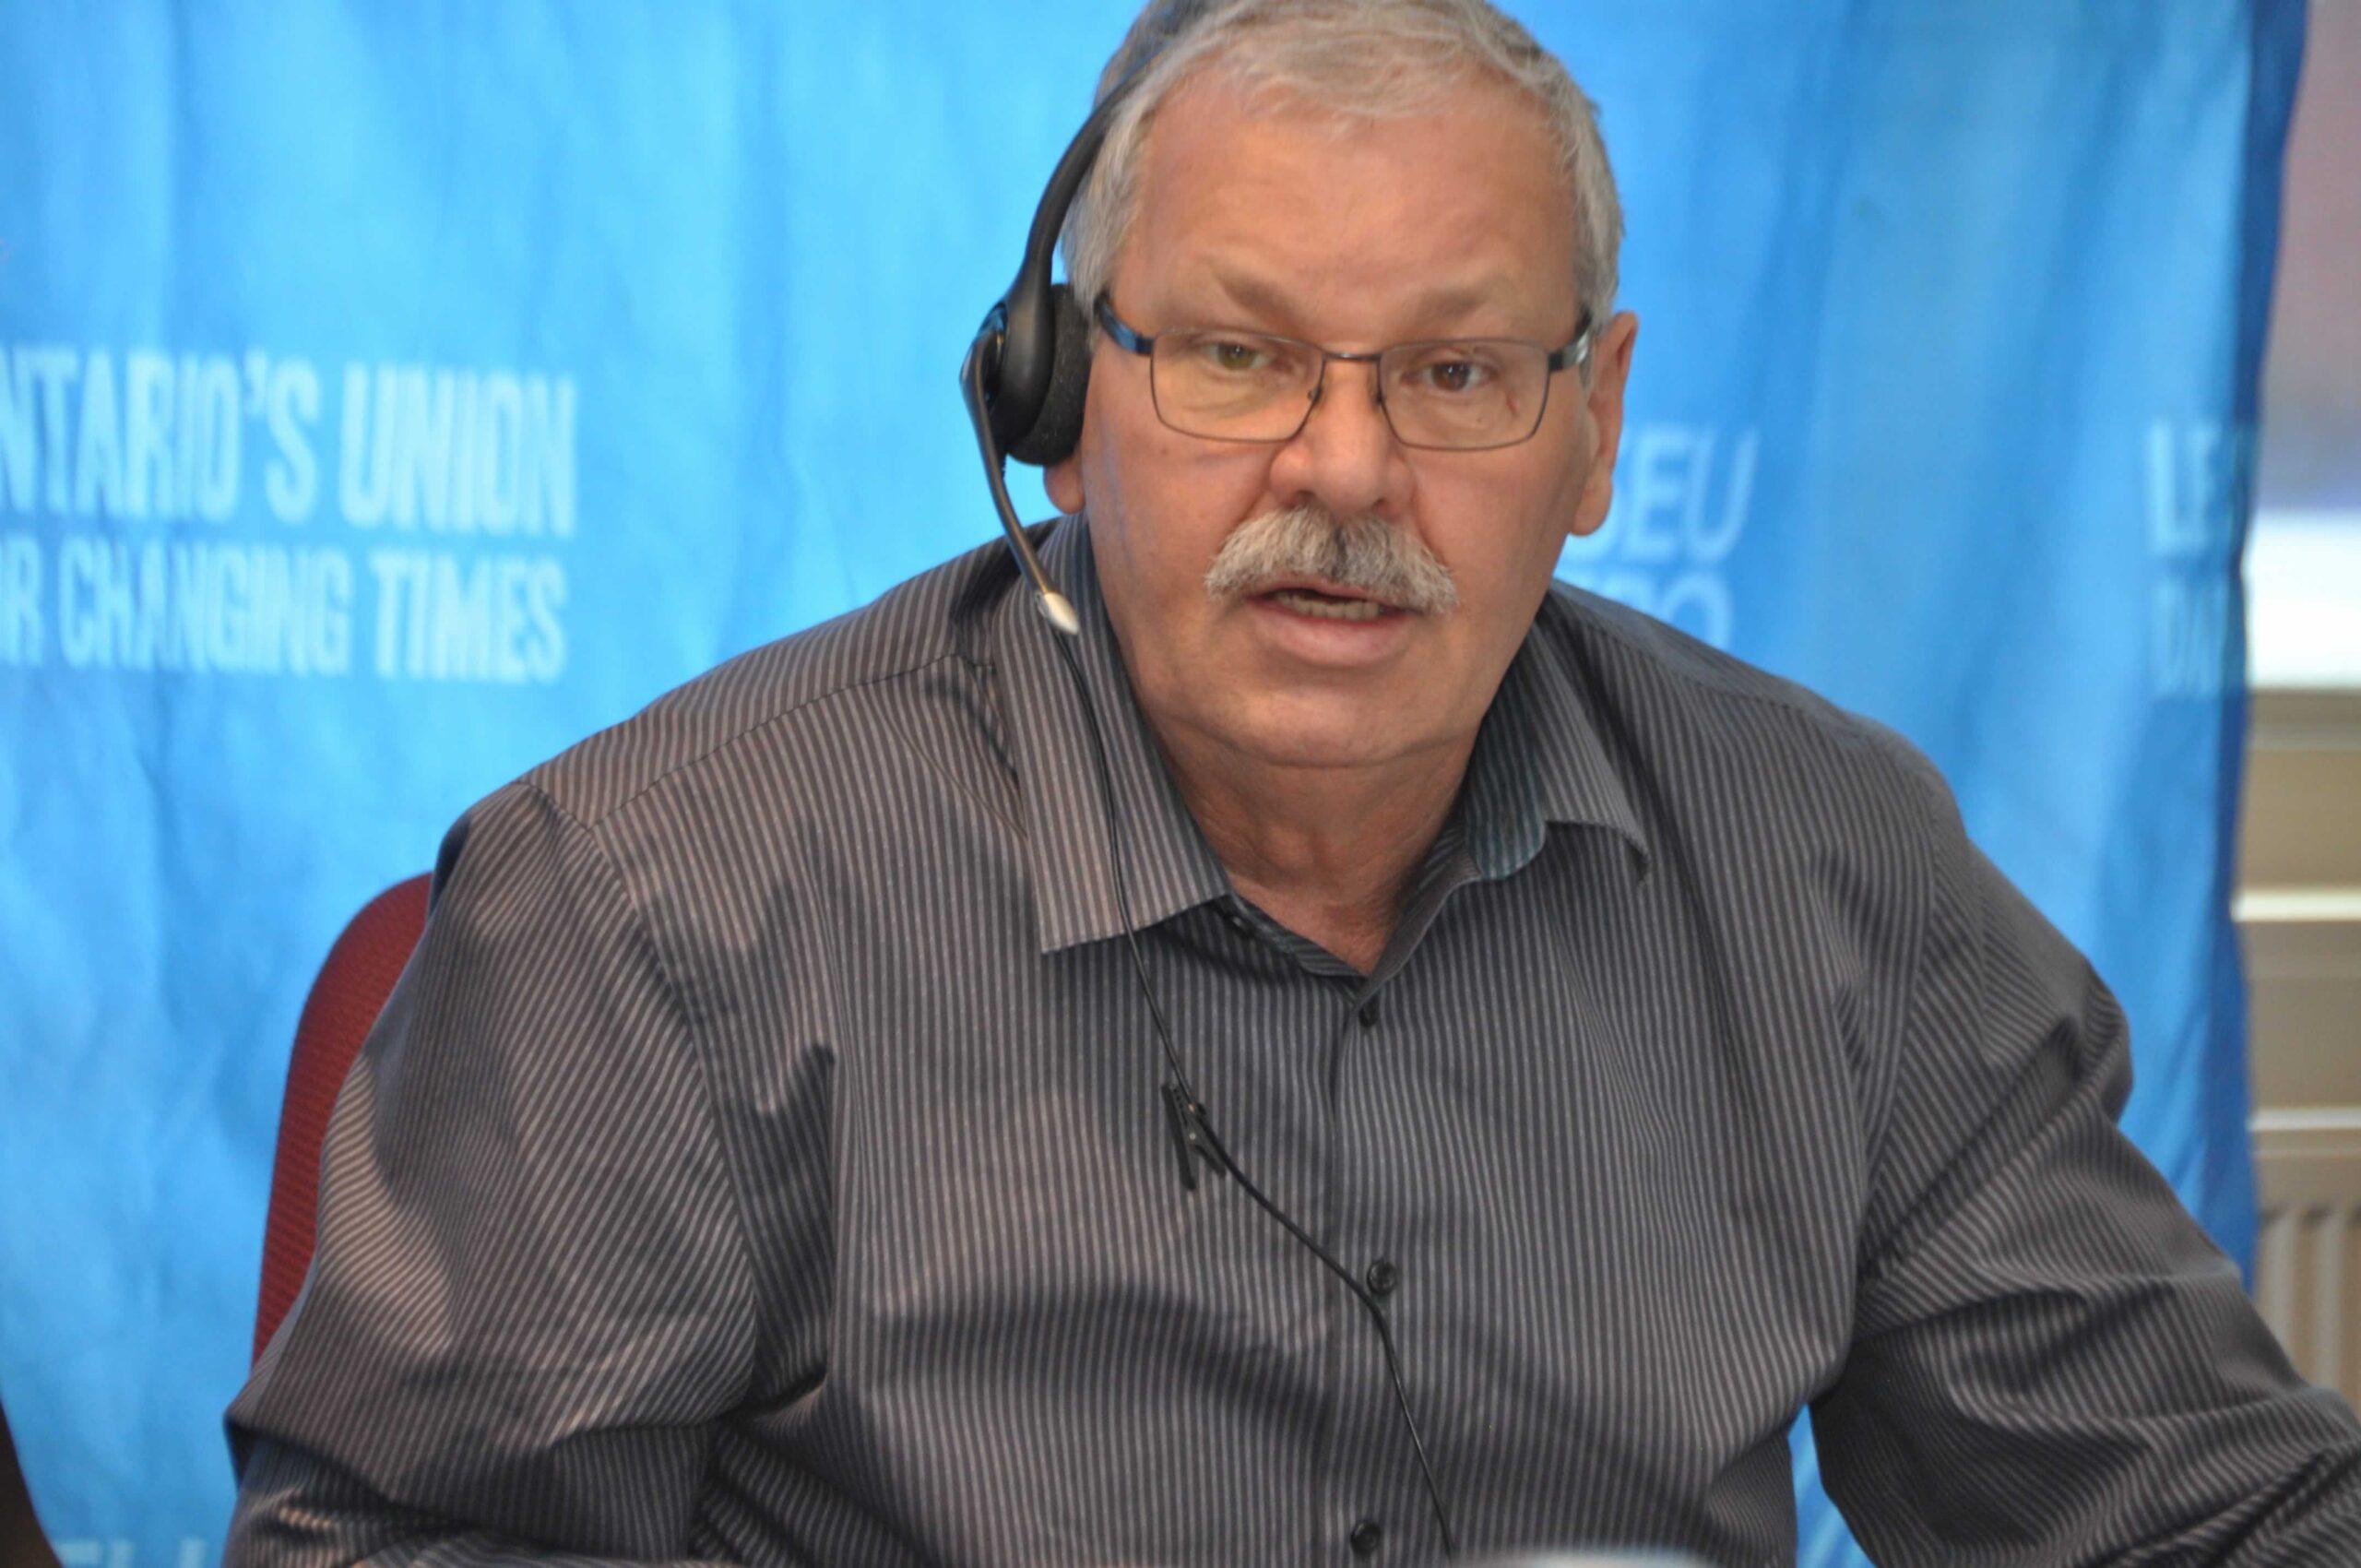 OPSEU president Warren Thomas